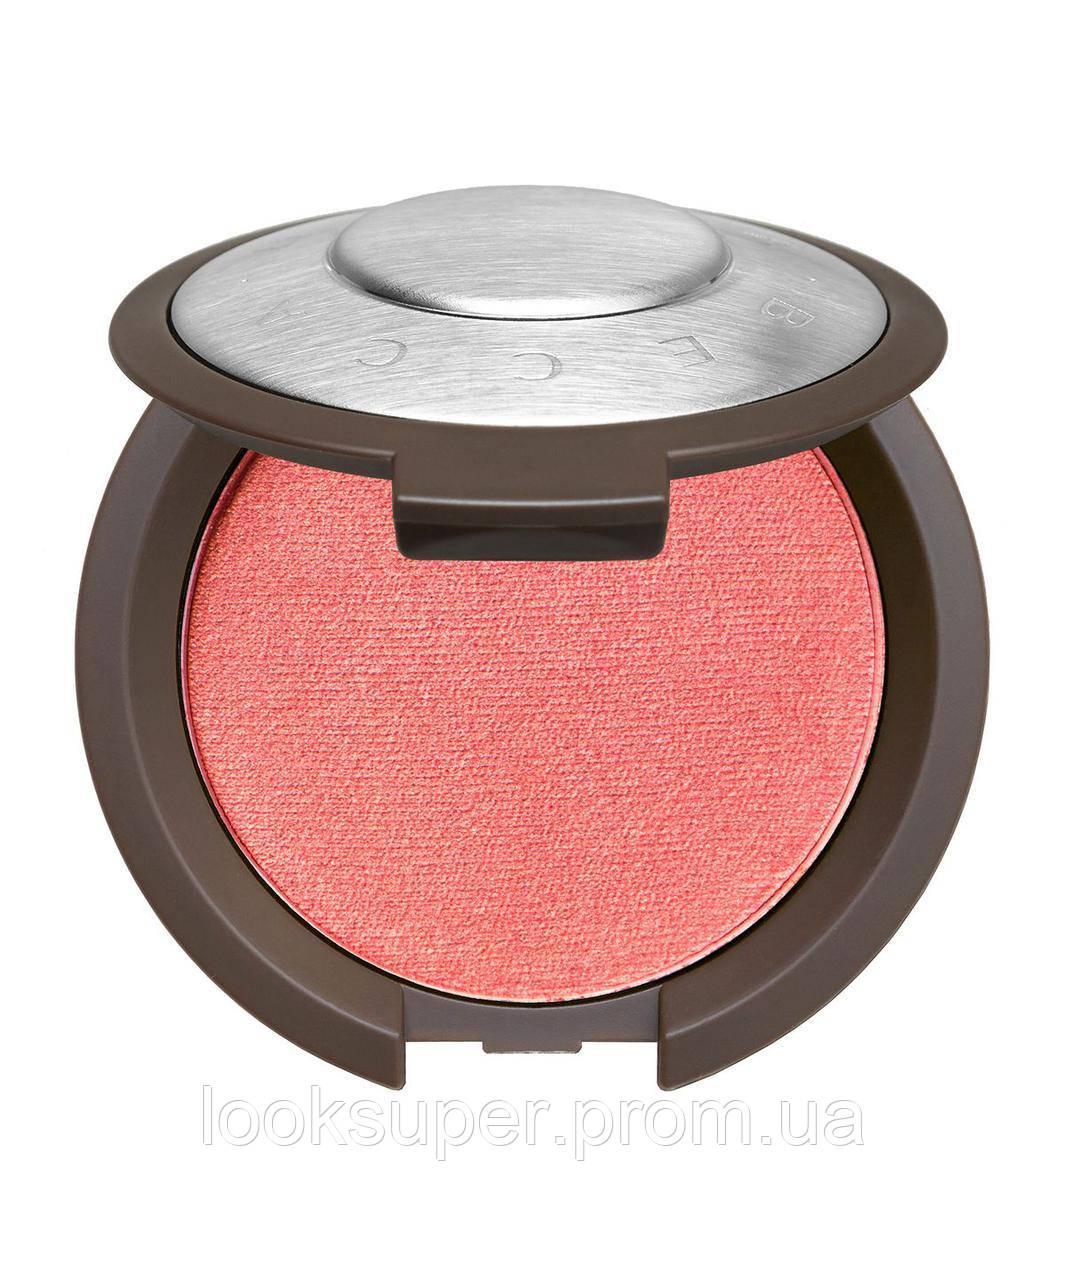 Румяна BECCA Shimmering Skin Perfector Luminous